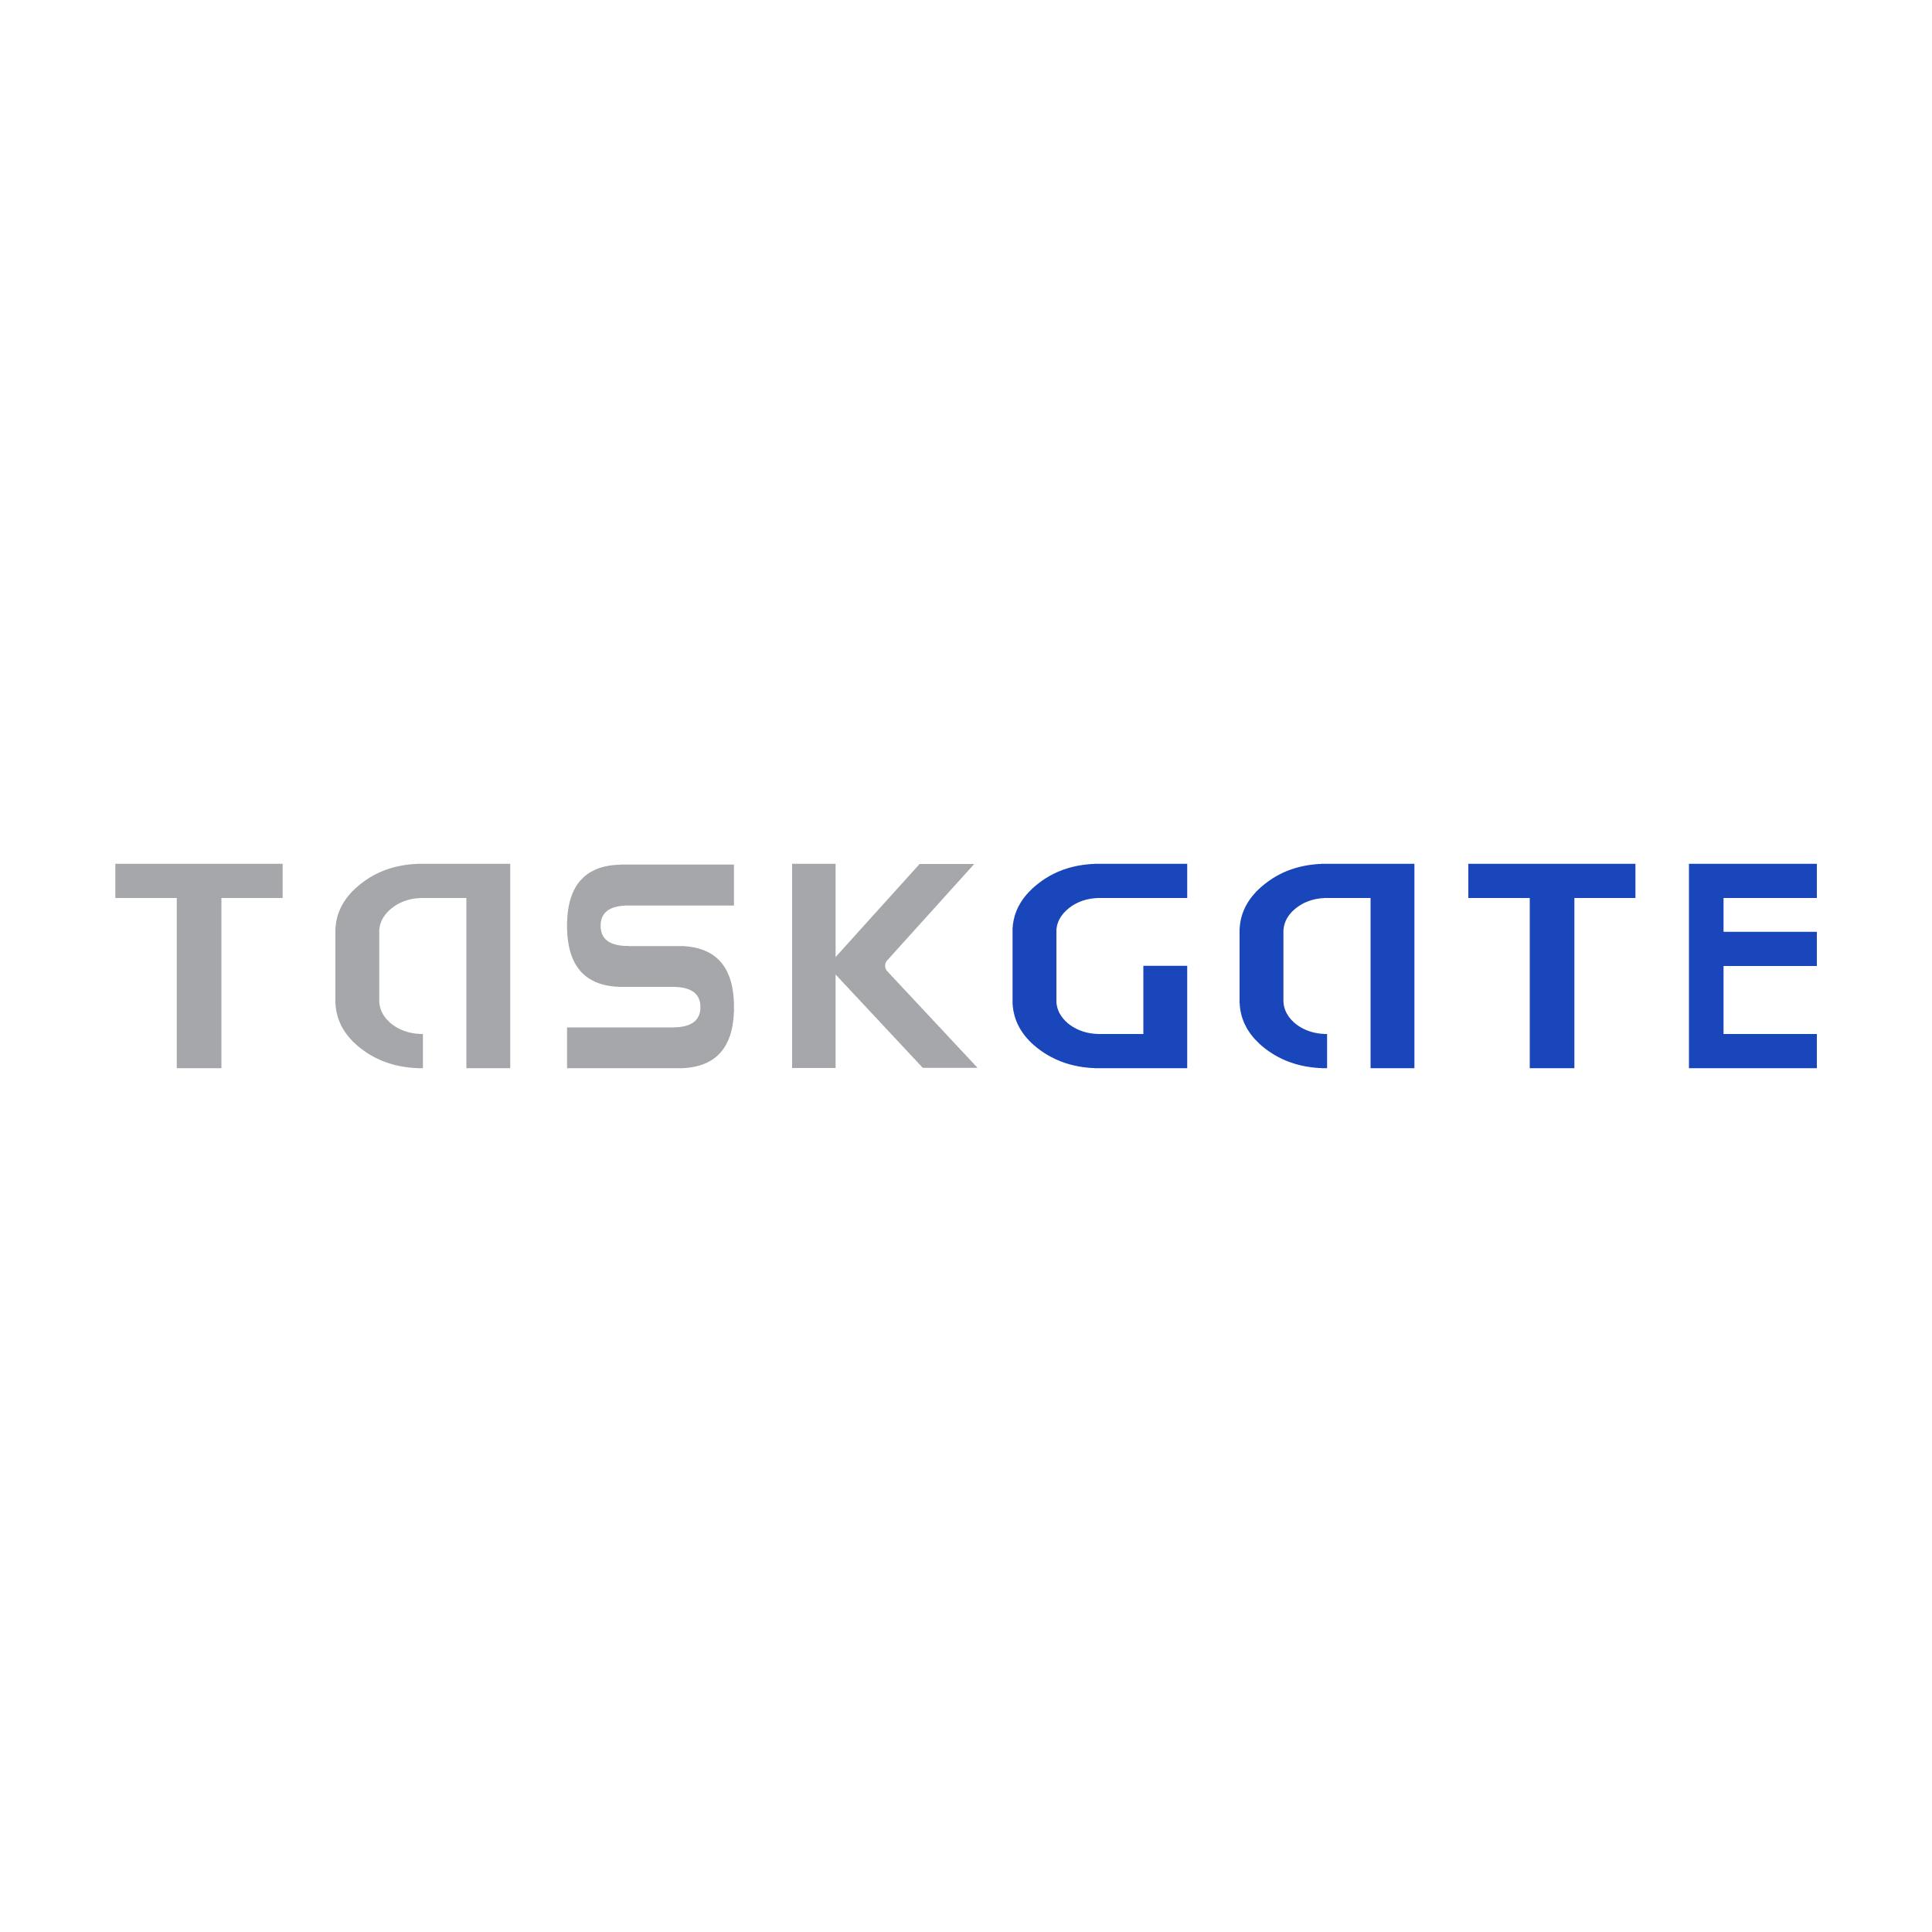 task-gate_logo-2500x2500-01